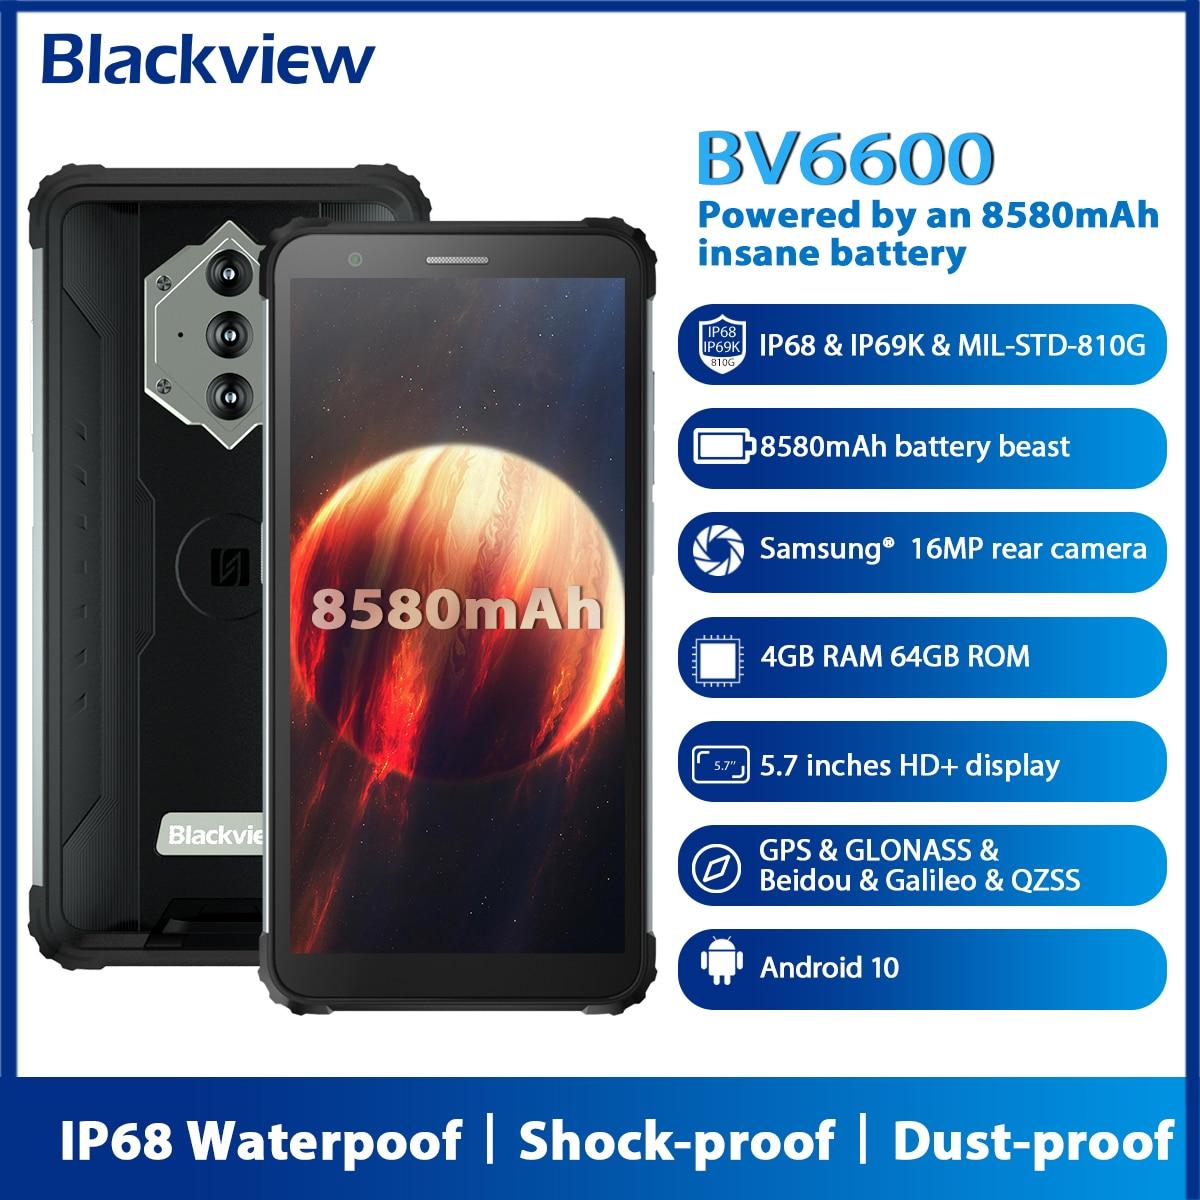 Blackview BV6600 Android 10 прочный смартфон IP68 Водонепроницаемый 8580 мАч Восьмиядерный 4 Гб + 64 Гб 5,7 дюйм FHD мобильный телефон 16MP камера NFC